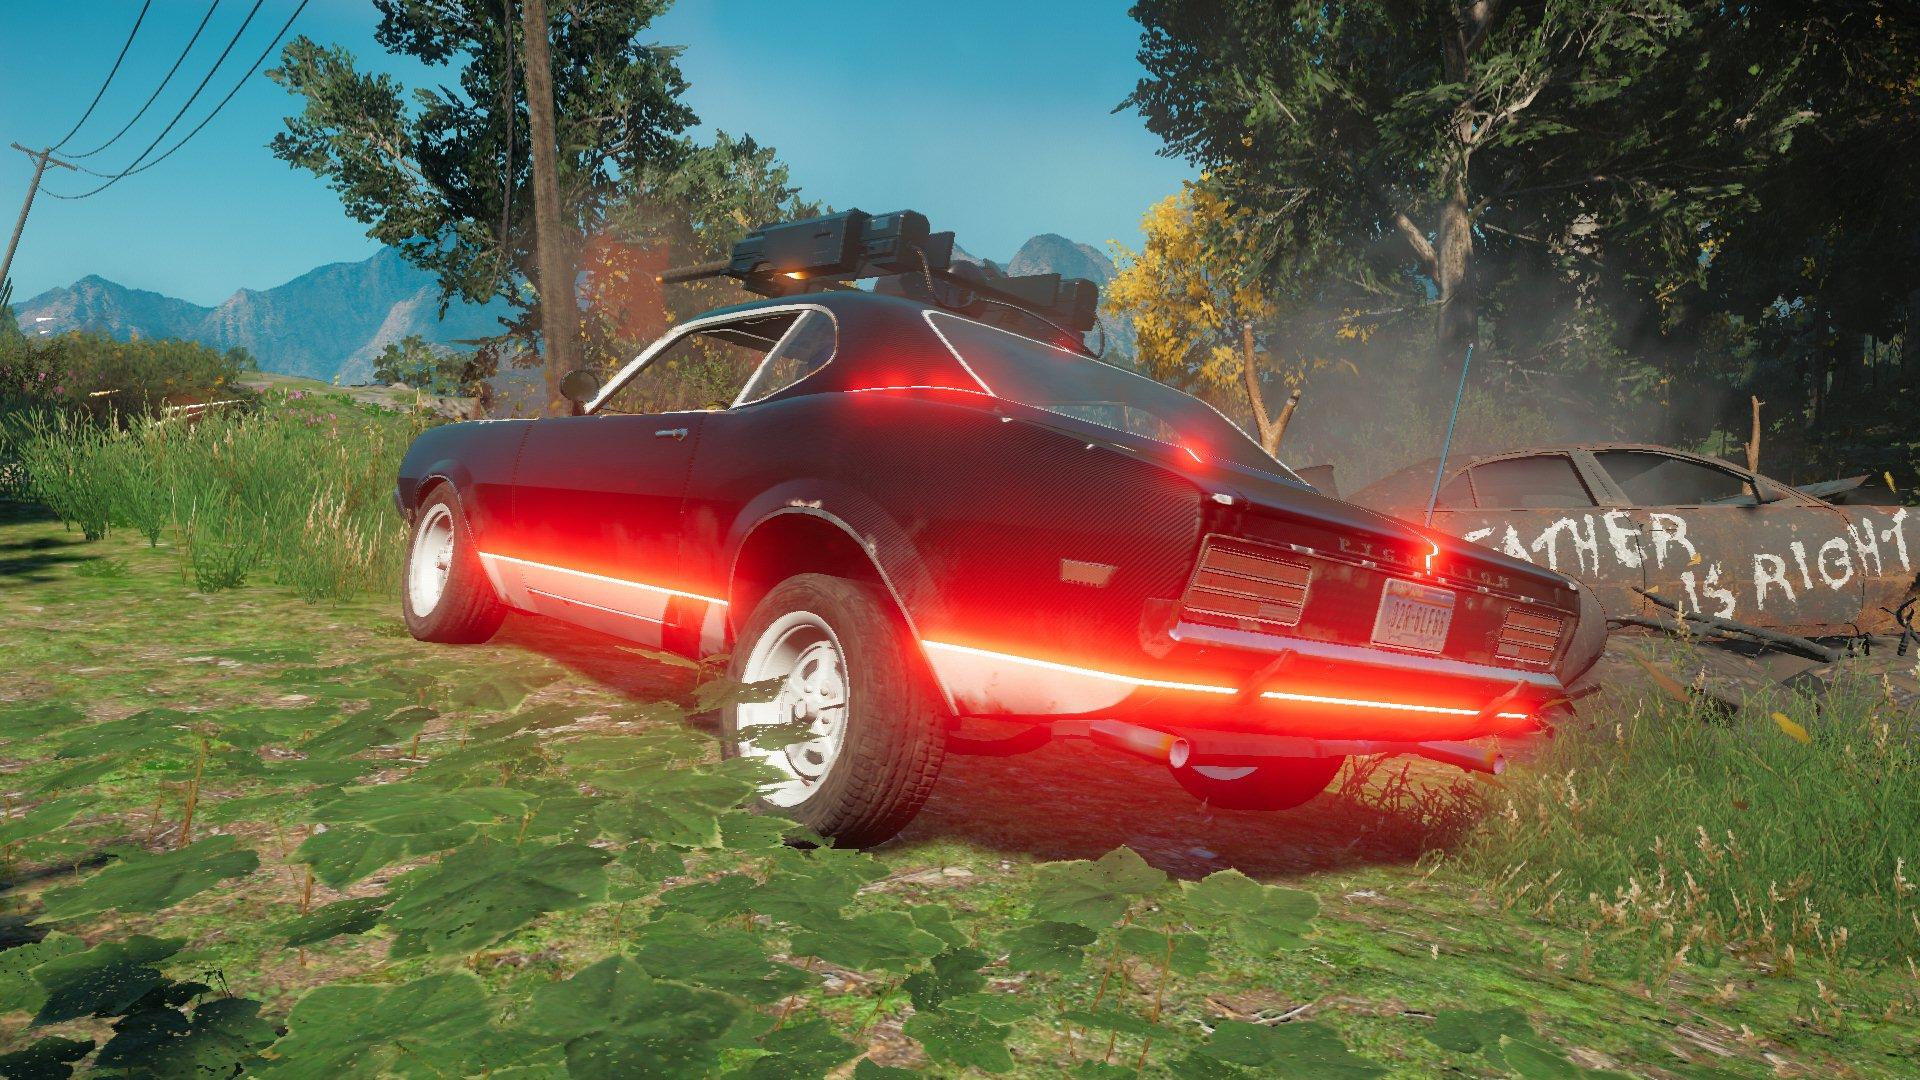 screenshot0001.jpg - Far Cry: New Dawn